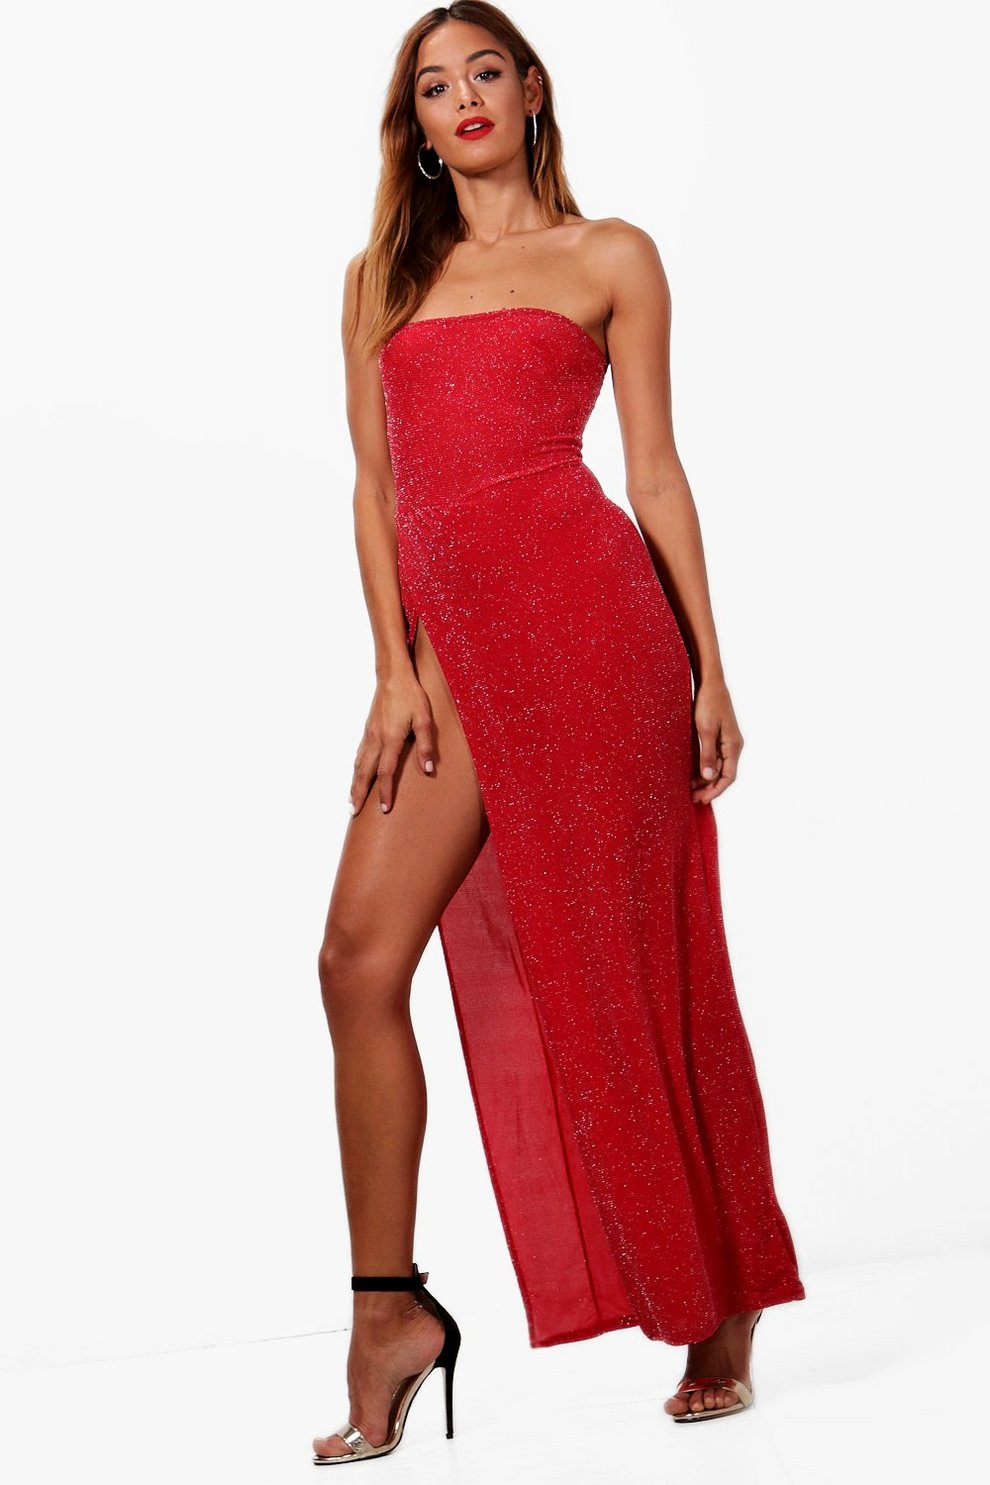 Red maxi dress with split